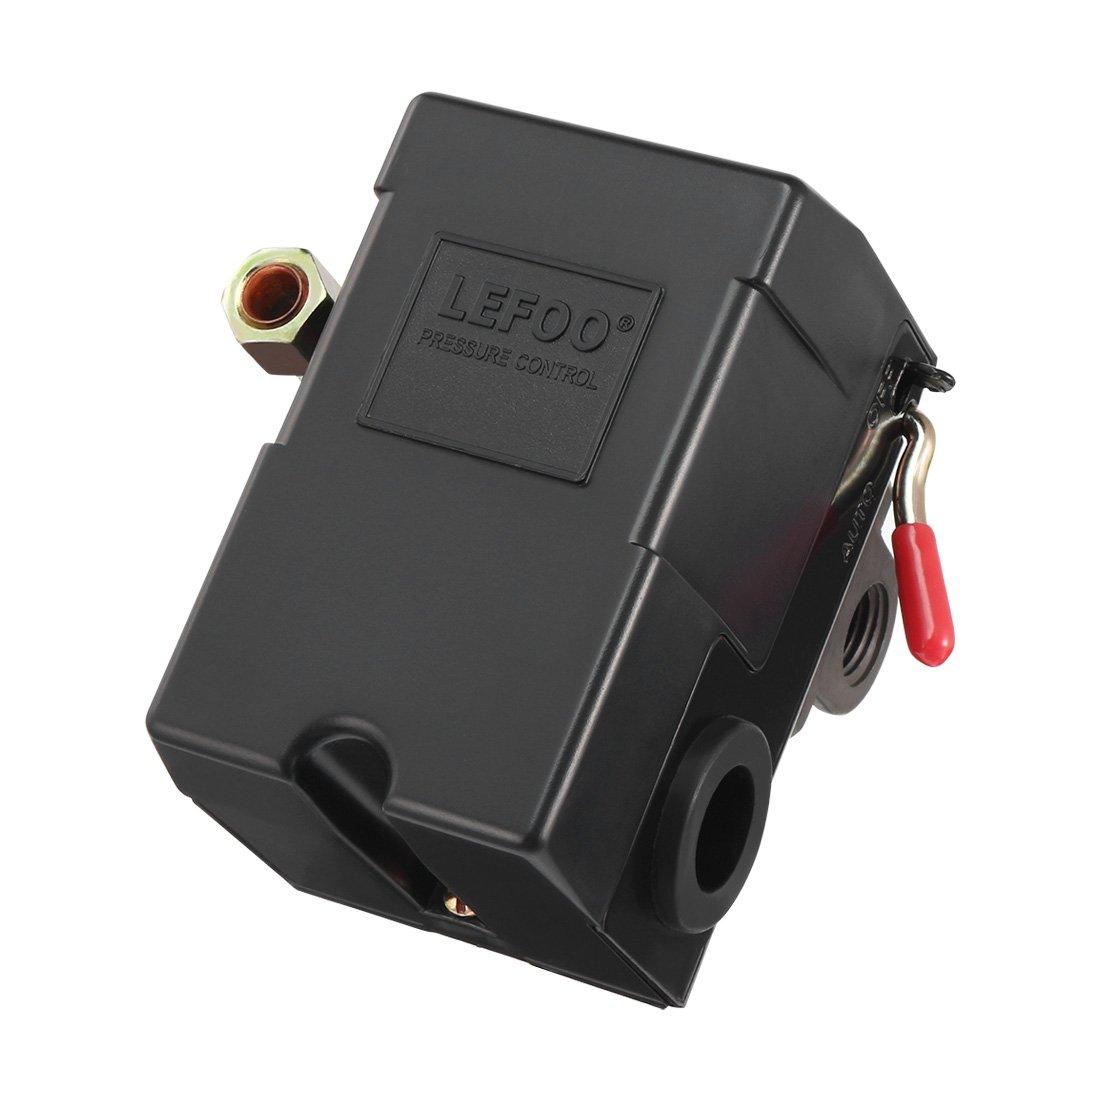 uxcell 20A 57-85 PSi 4 Port Air Compressor Pressure Switch Control Valve a17061300ux0130